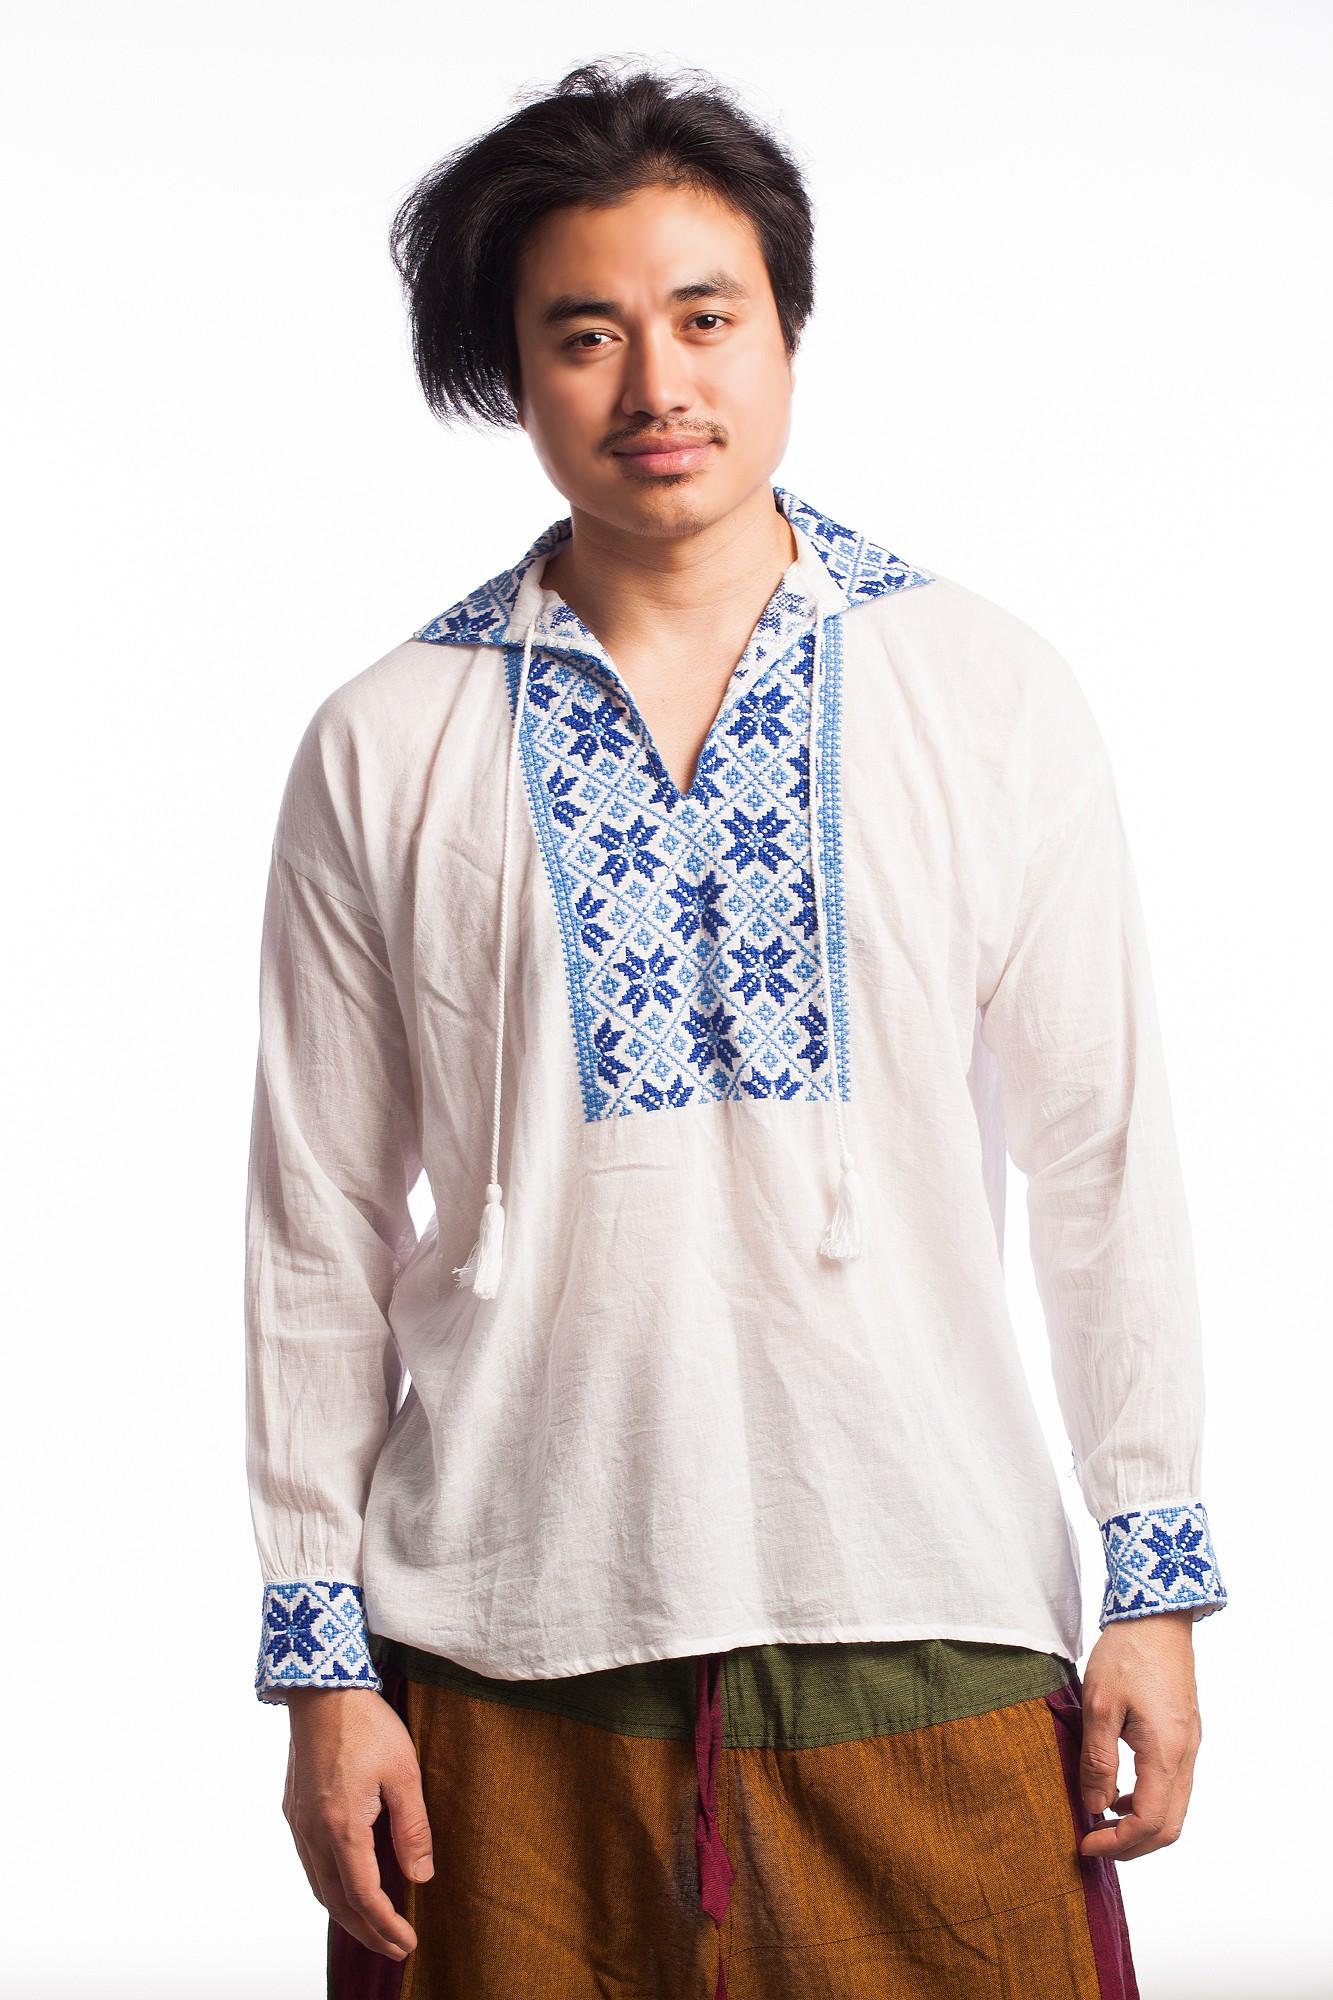 Camasa stil ie din bumbac alb cu motive etnice albastre